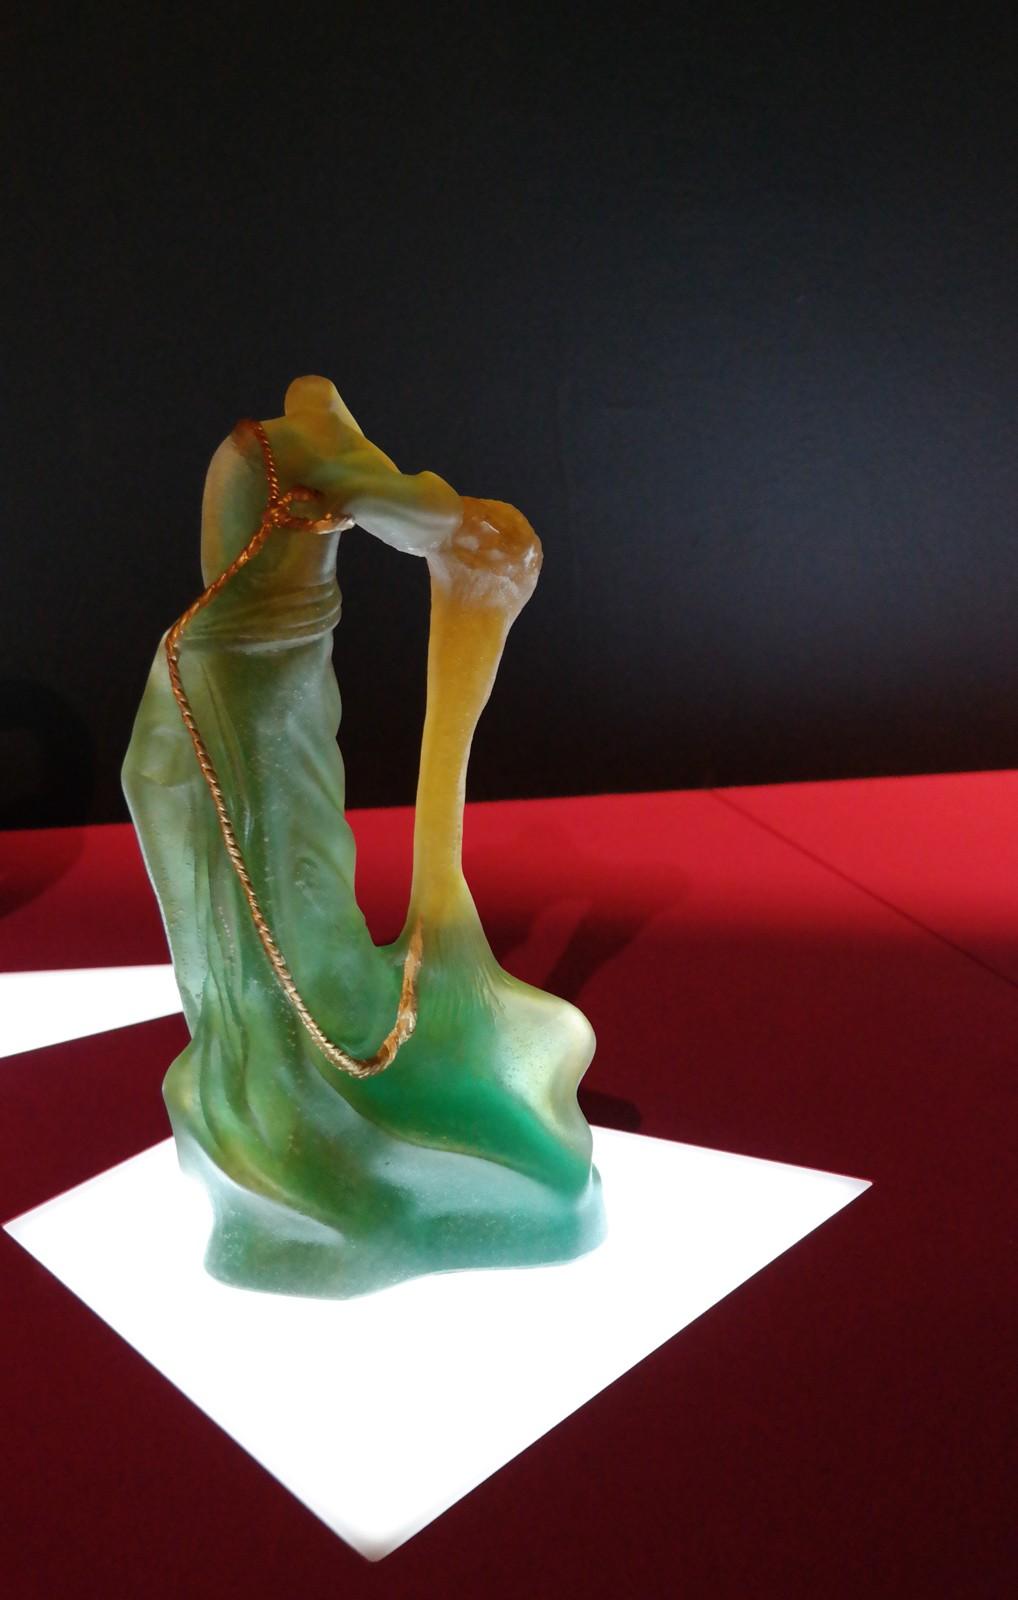 Vénus de Milo hystérique, 1983, Salvador Dali